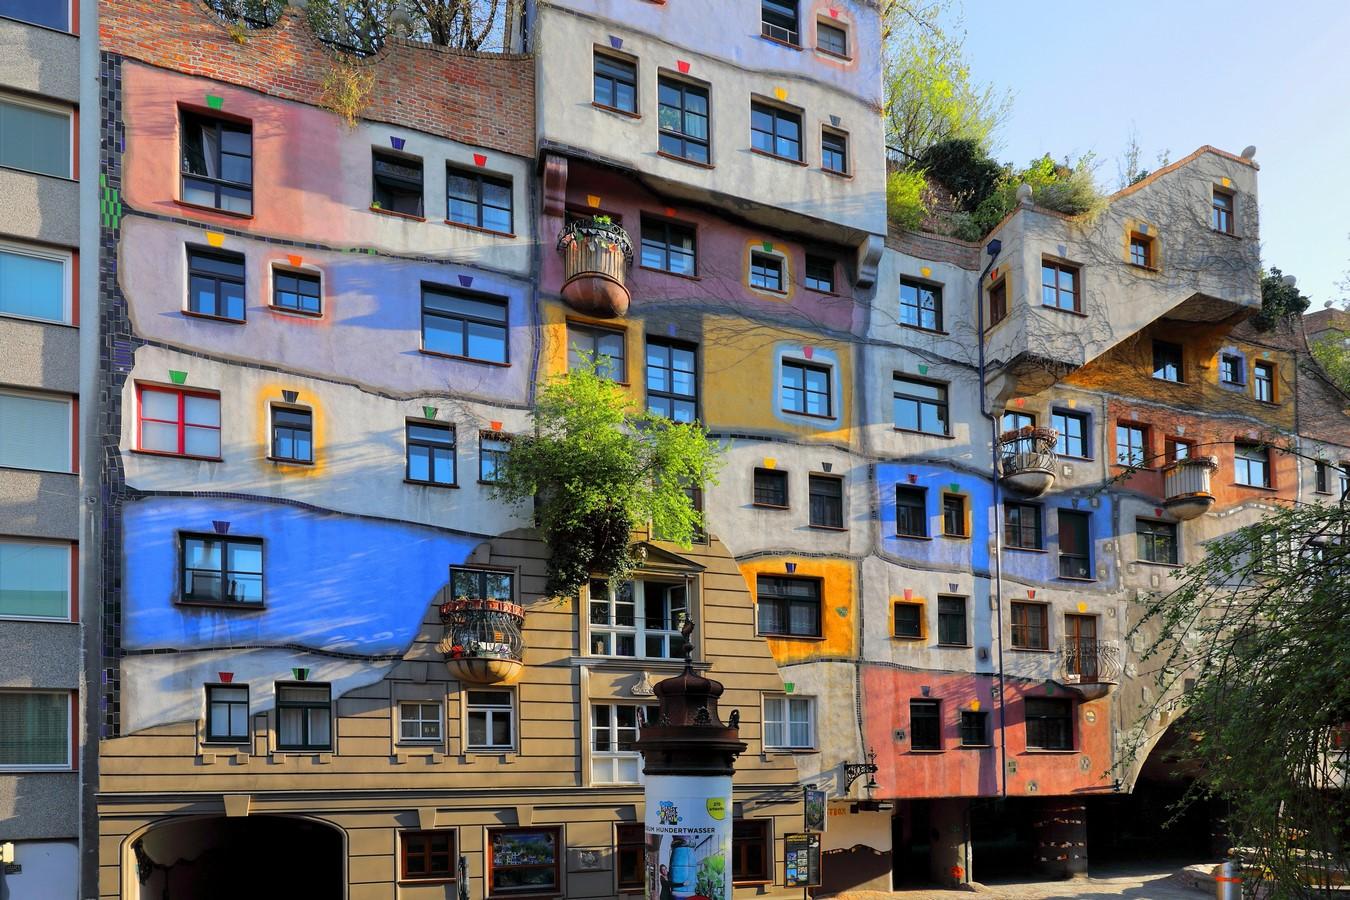 Hundertwasserhaus, Kegelgasse 36-38, 1030 Wien, Austria- Sheet2